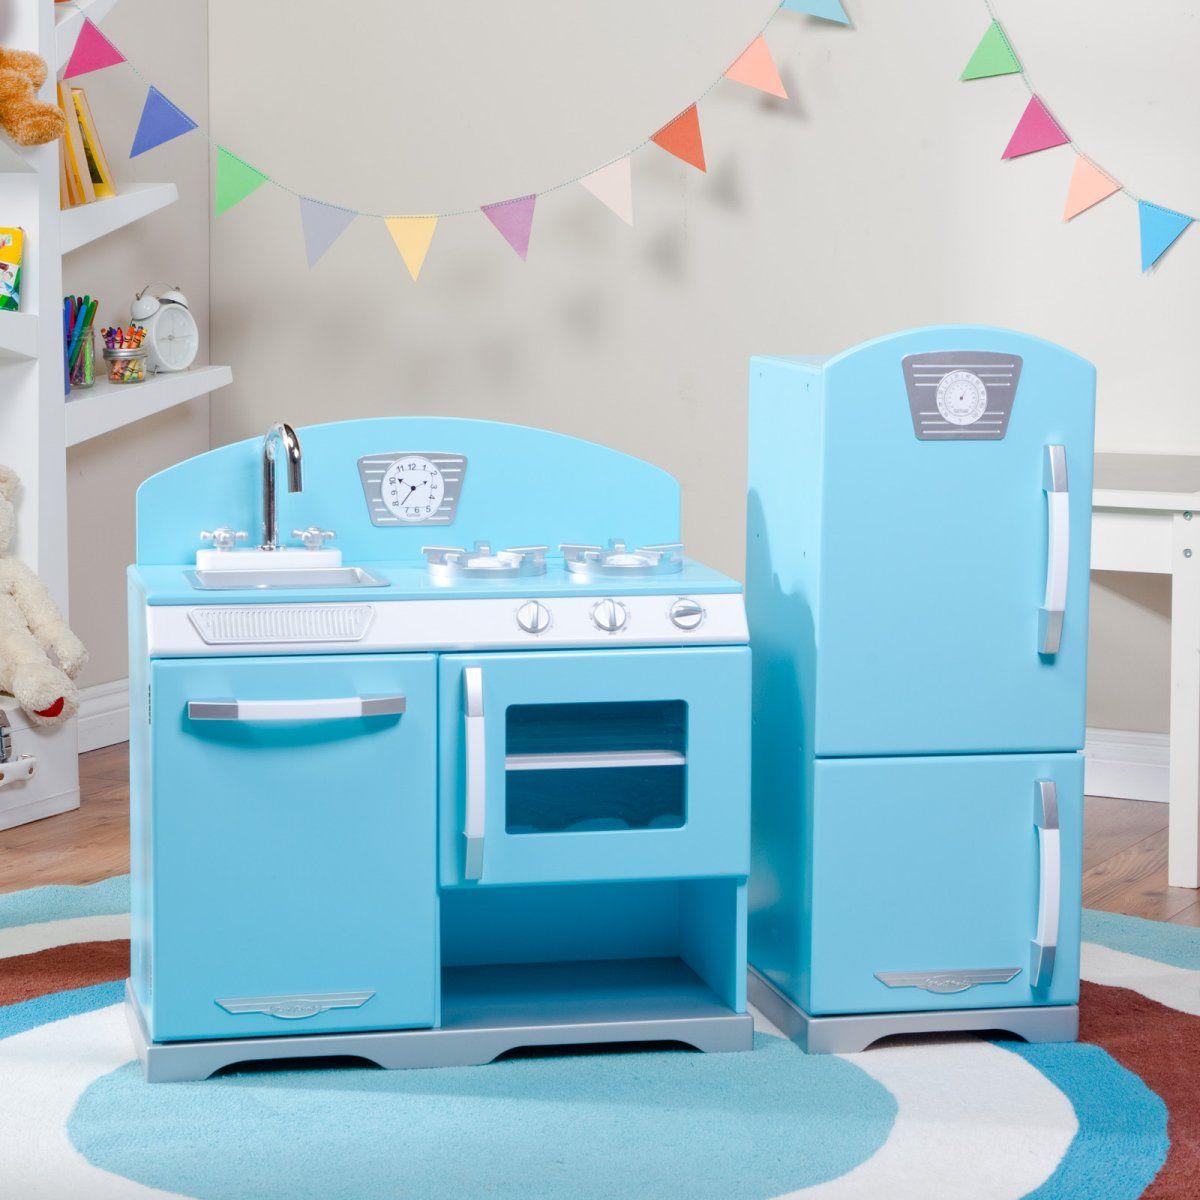 Retro Play Kitchen Set Kidkraft 2 Piece Blue Retro Play Kitchen Blue 18999 Www